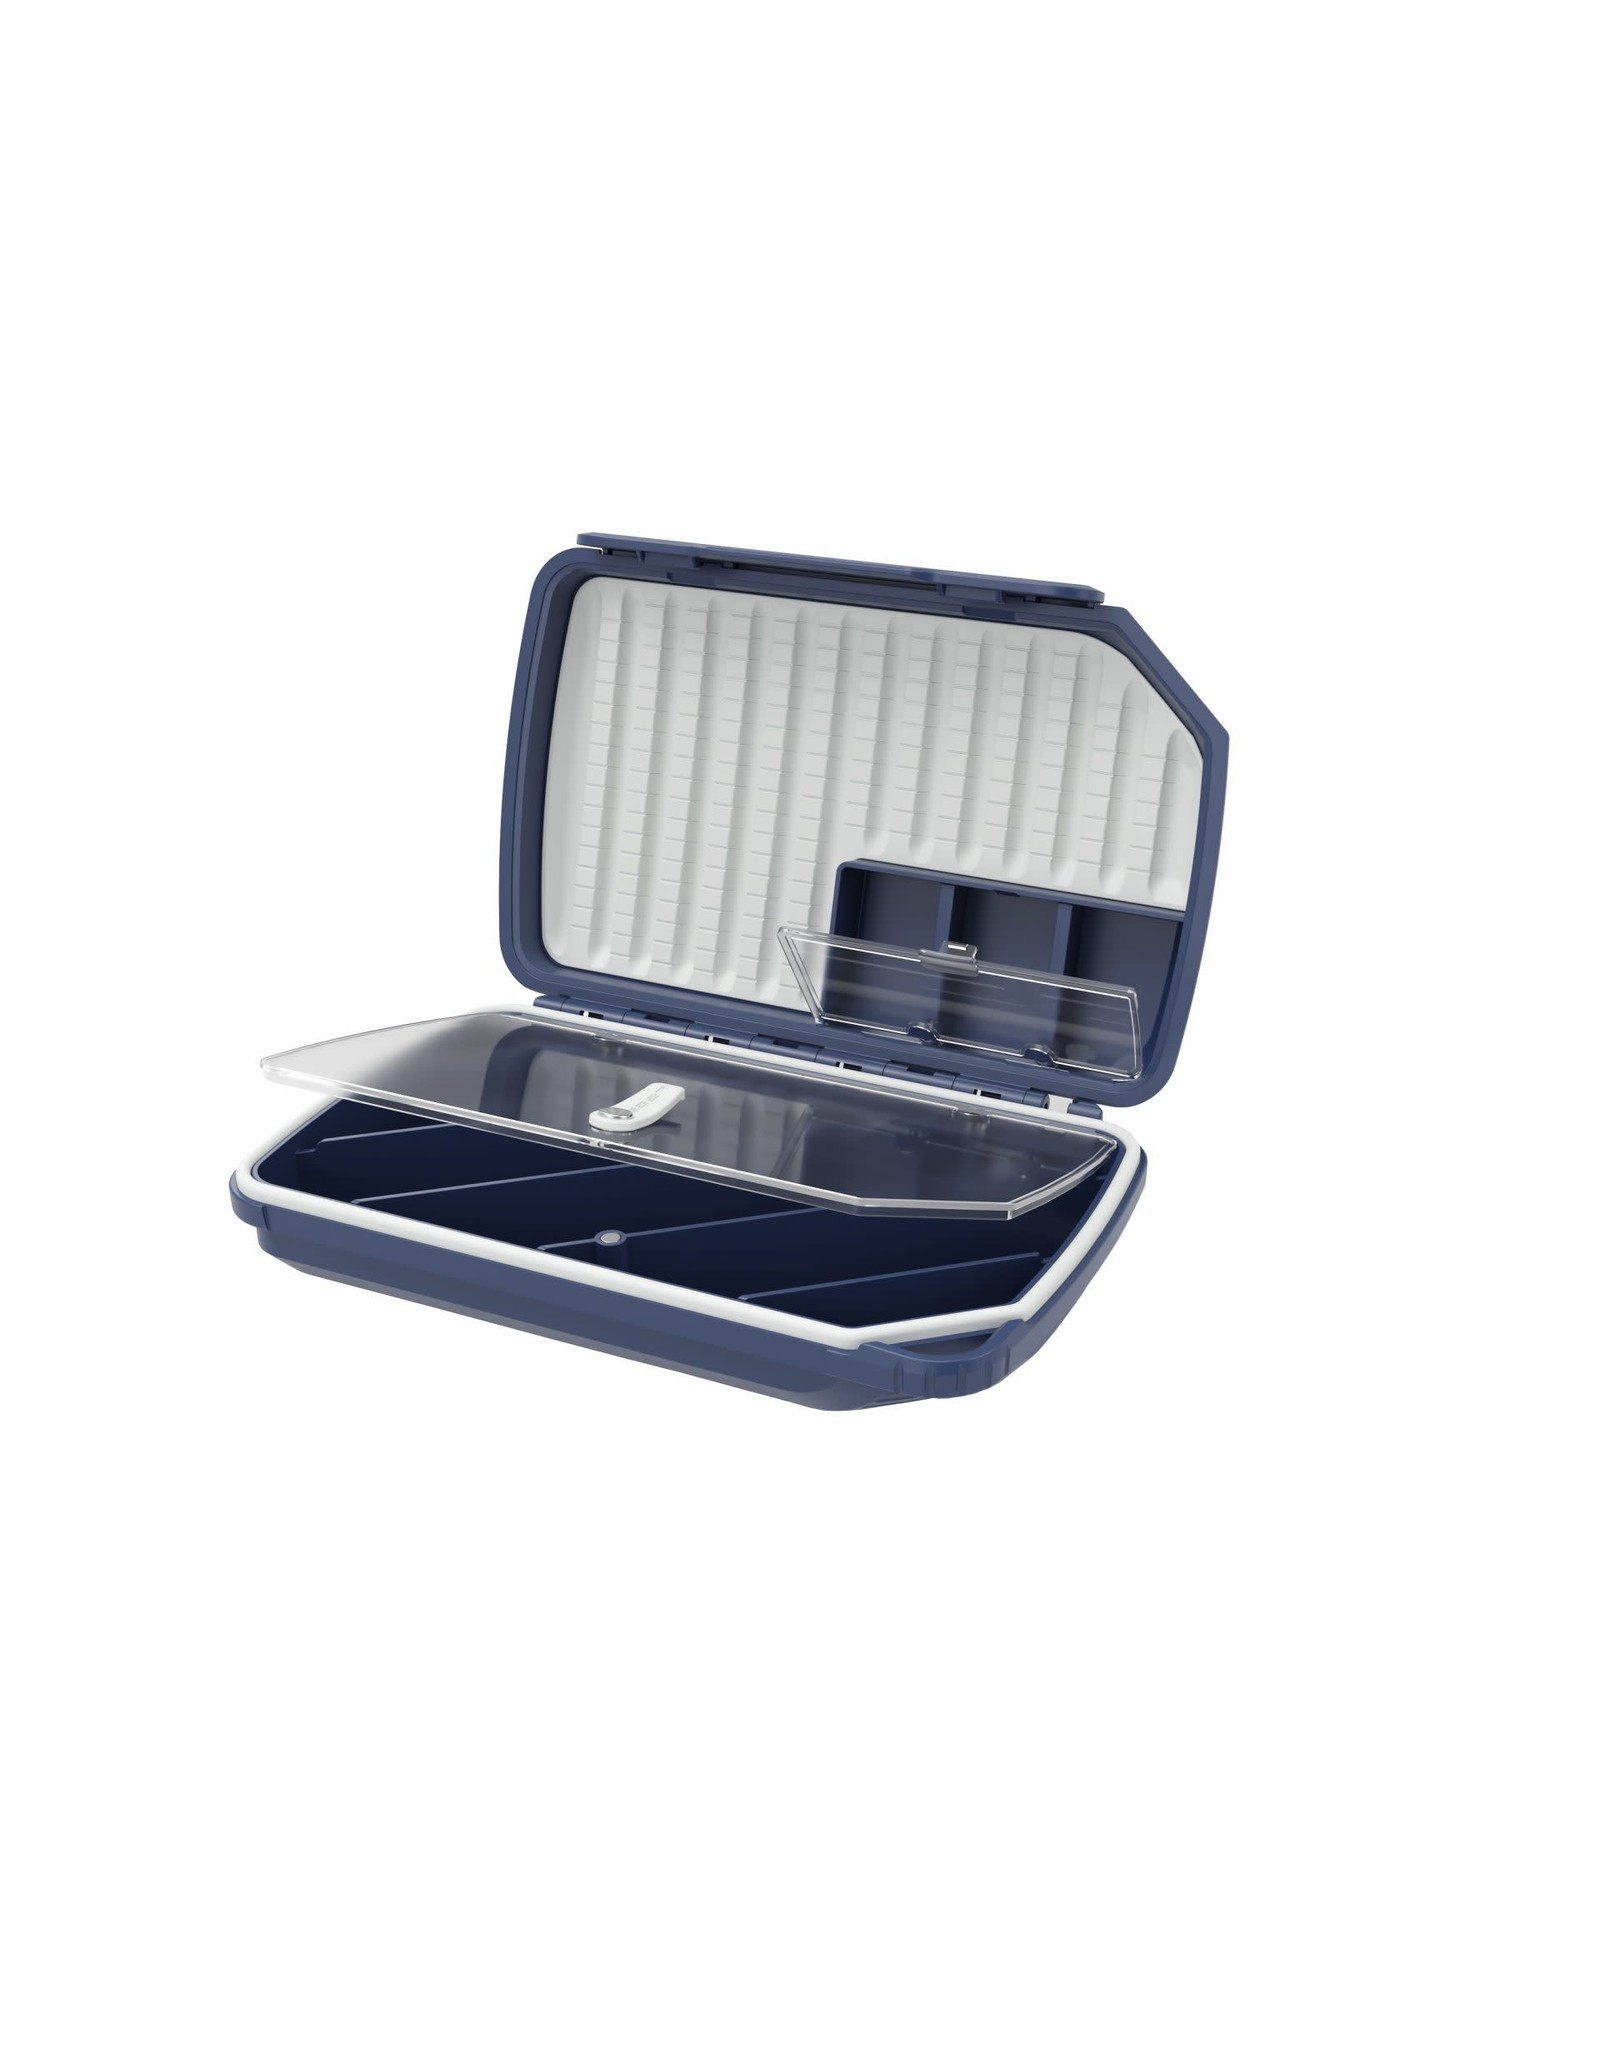 LOOP Opti 180 Tube Fly Box - Swedish Blue